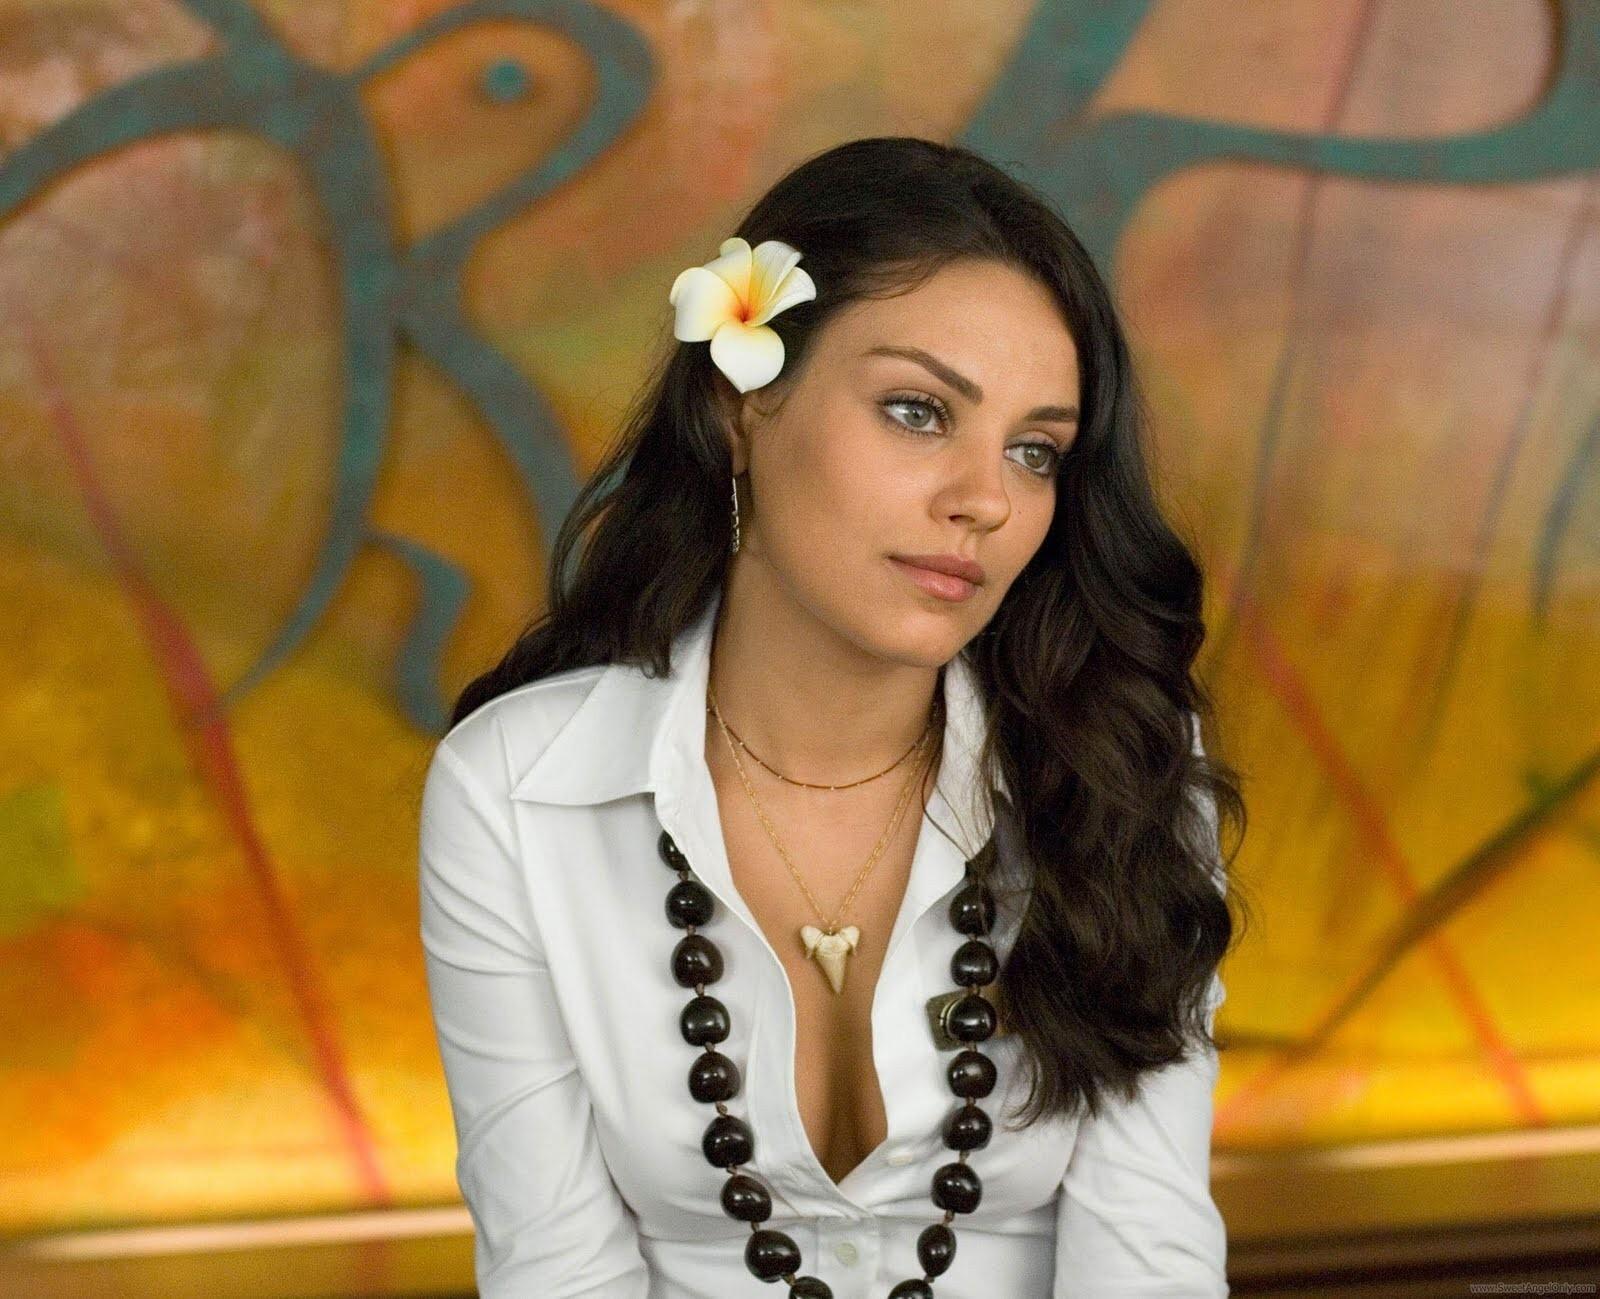 Hot_Mila_Kunis_Hollywood_Actress.jpg